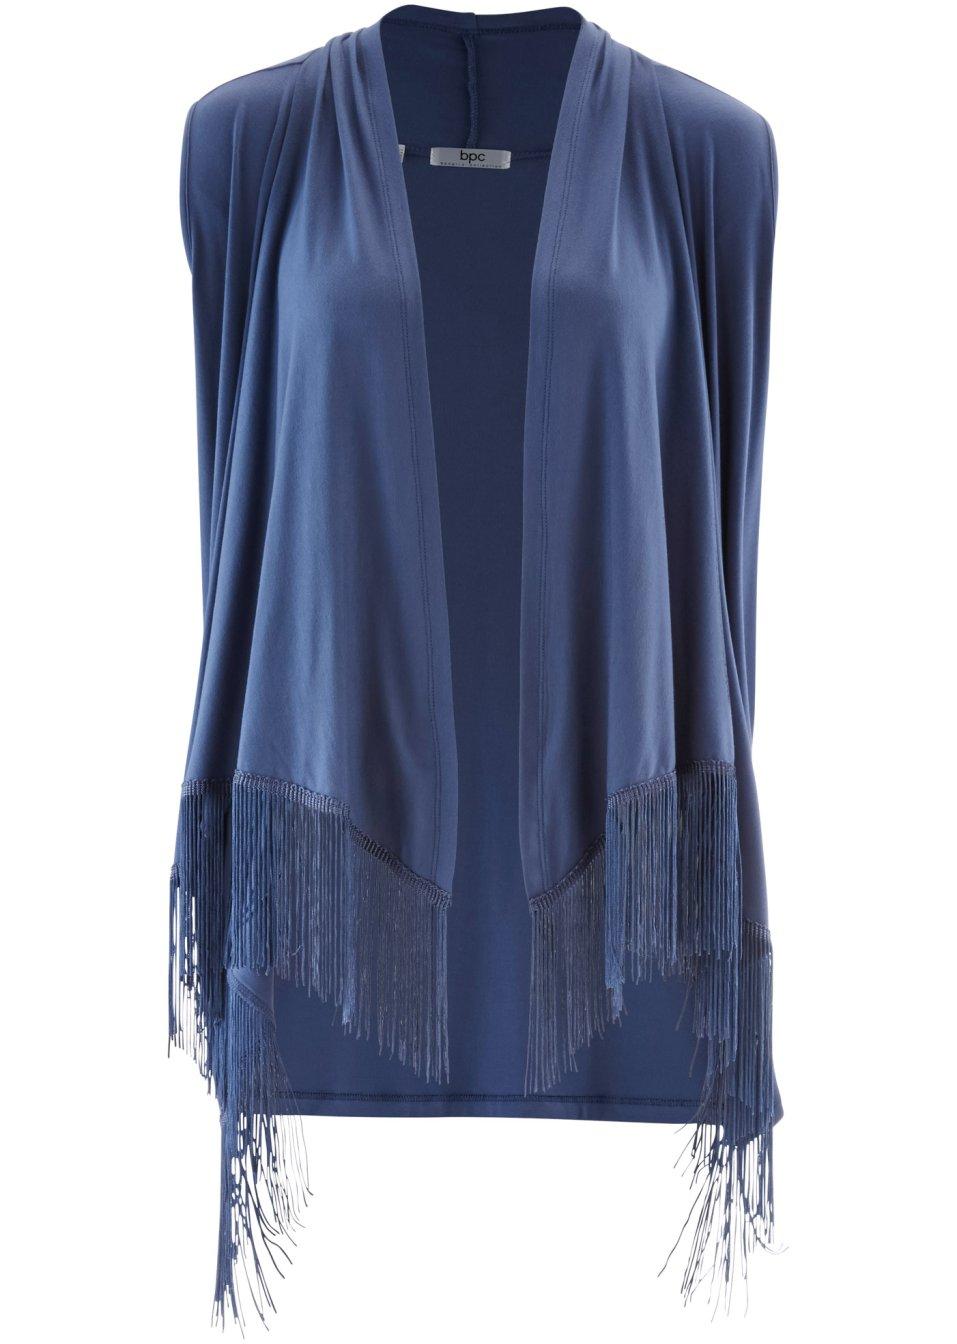 shirt weste mit fransen indigo bpc bonprix collection. Black Bedroom Furniture Sets. Home Design Ideas